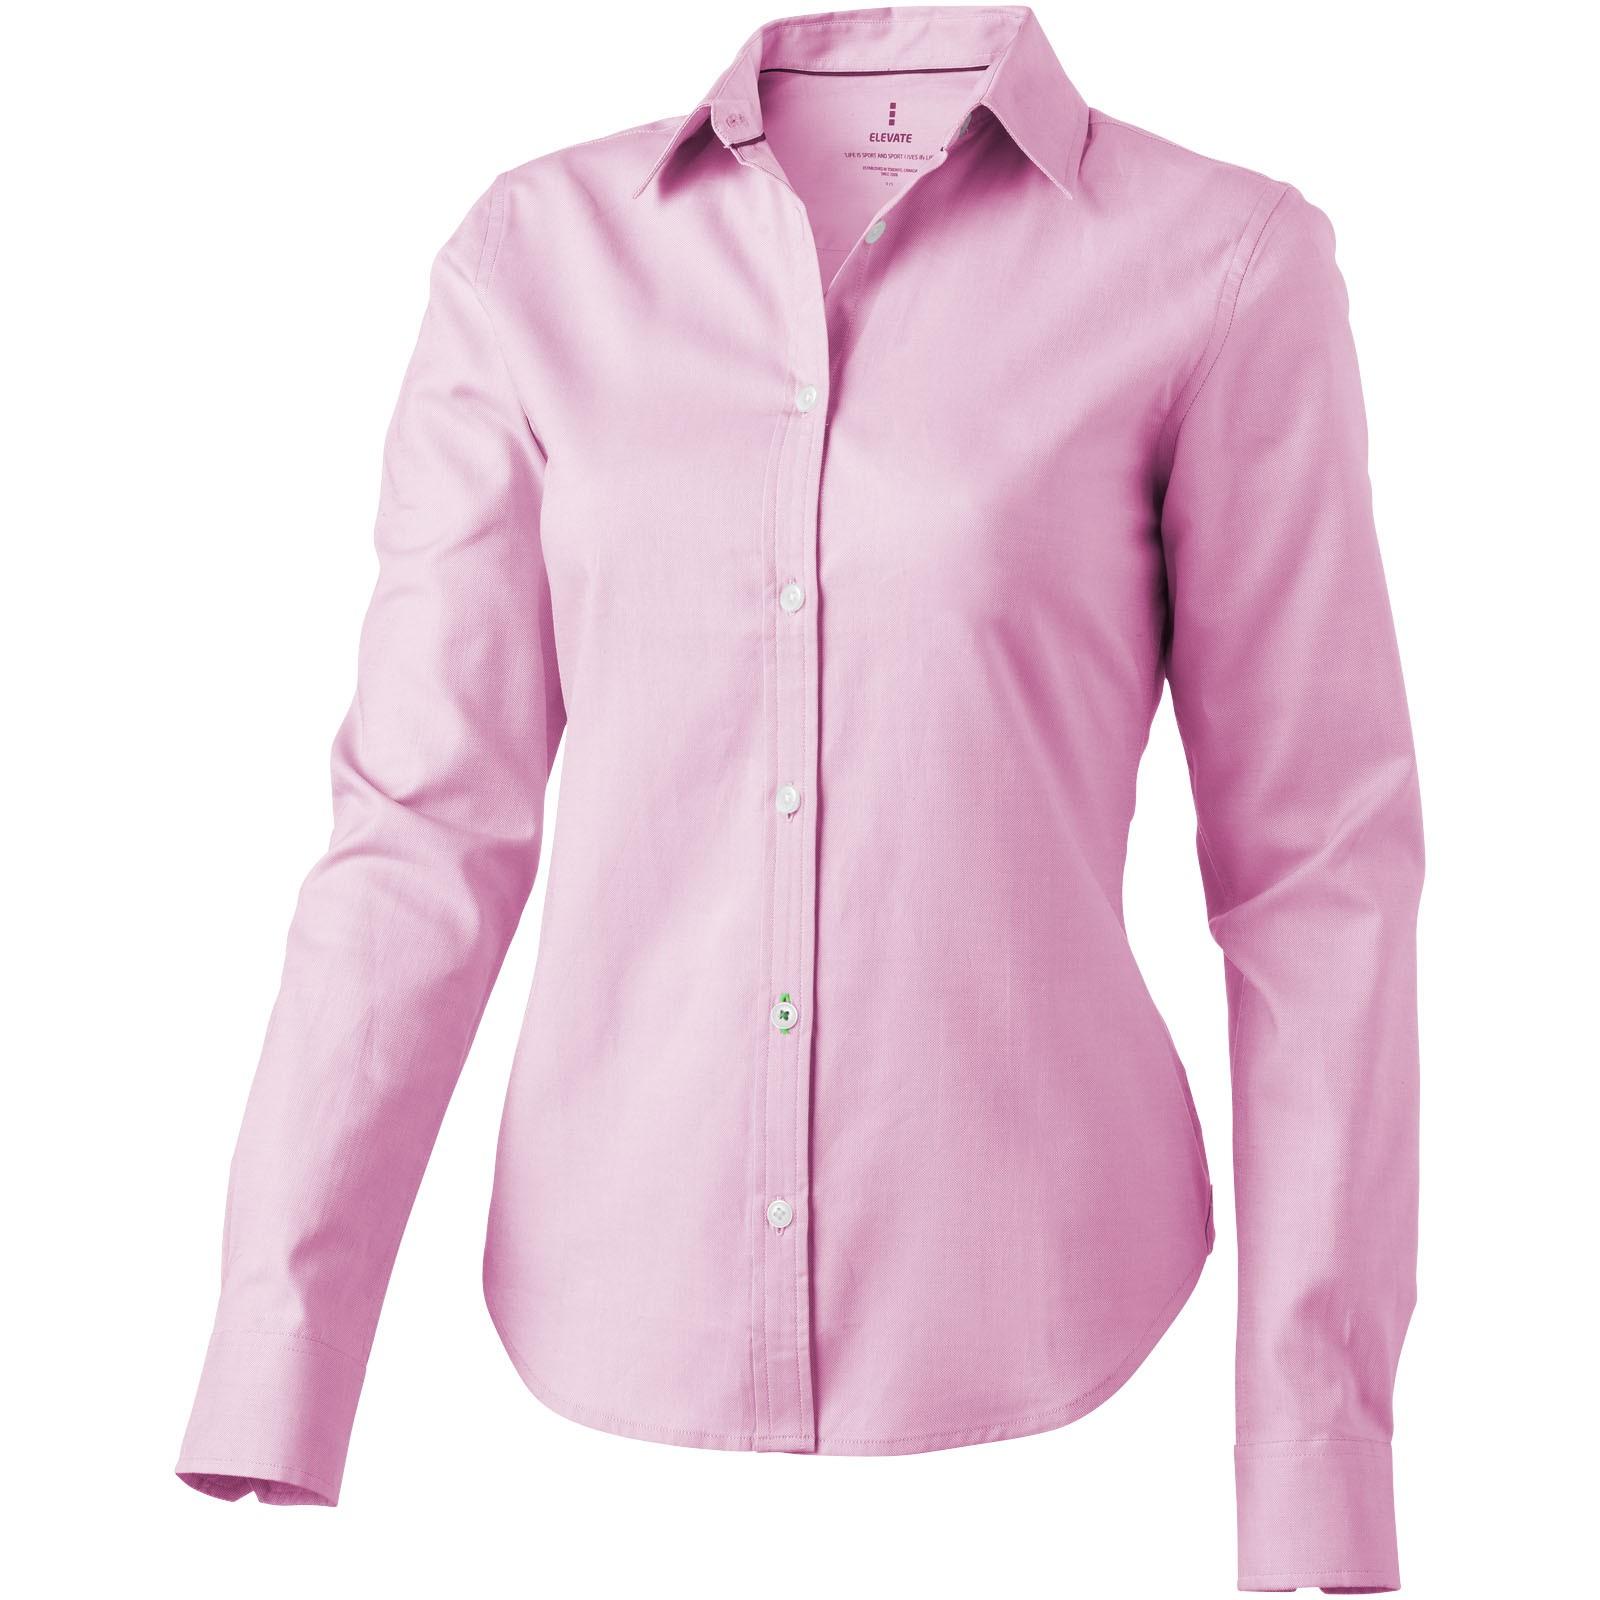 Vaillant long sleeve ladies shirt - Magenta / XS